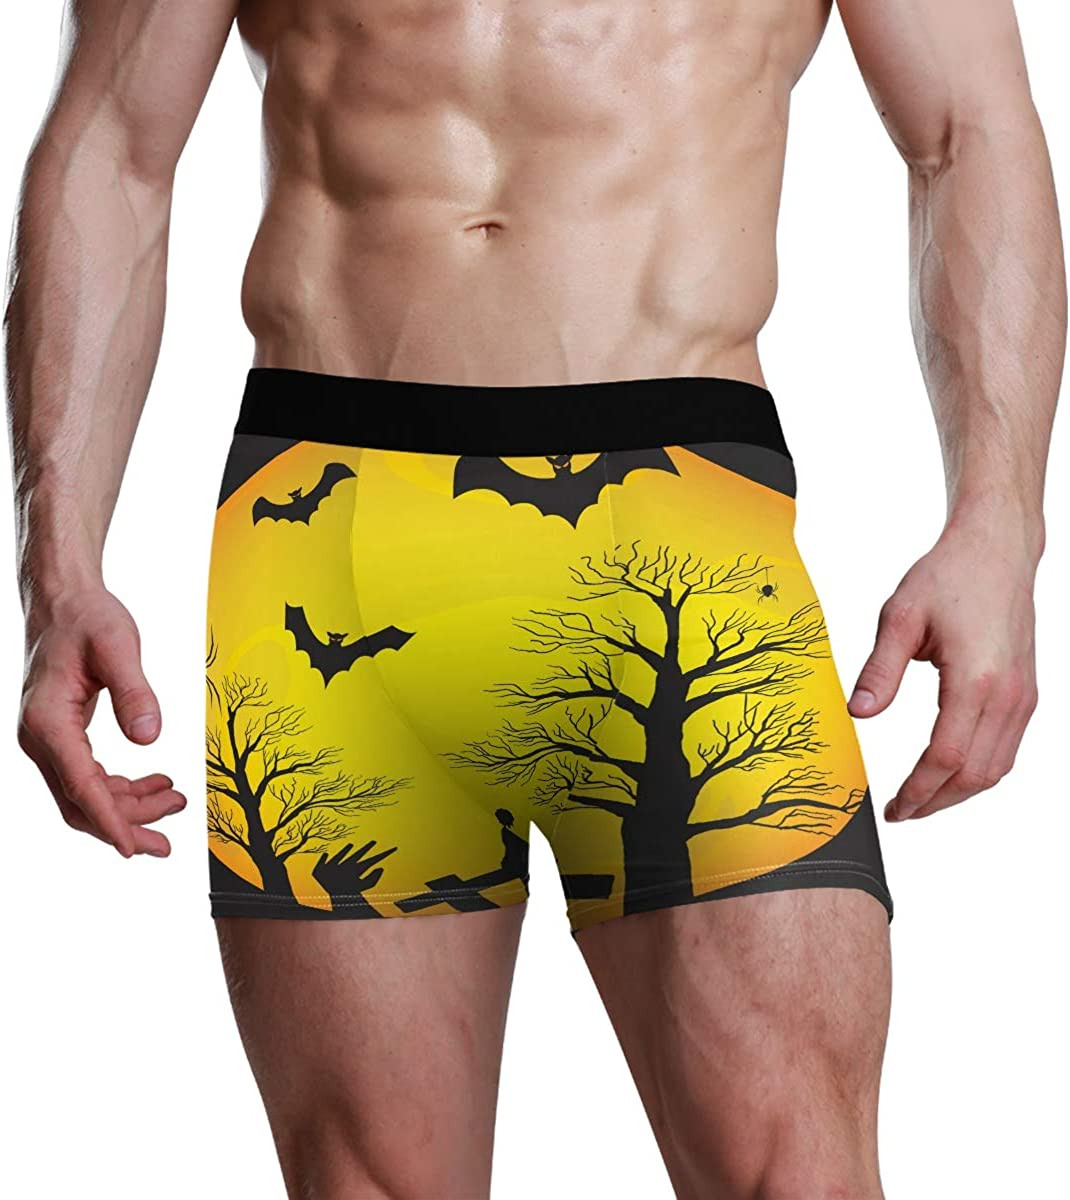 HangWang Mens Underwear Briefs Lonely Big Round Moon Breathable Long Boxer Briefs Underwear Boys